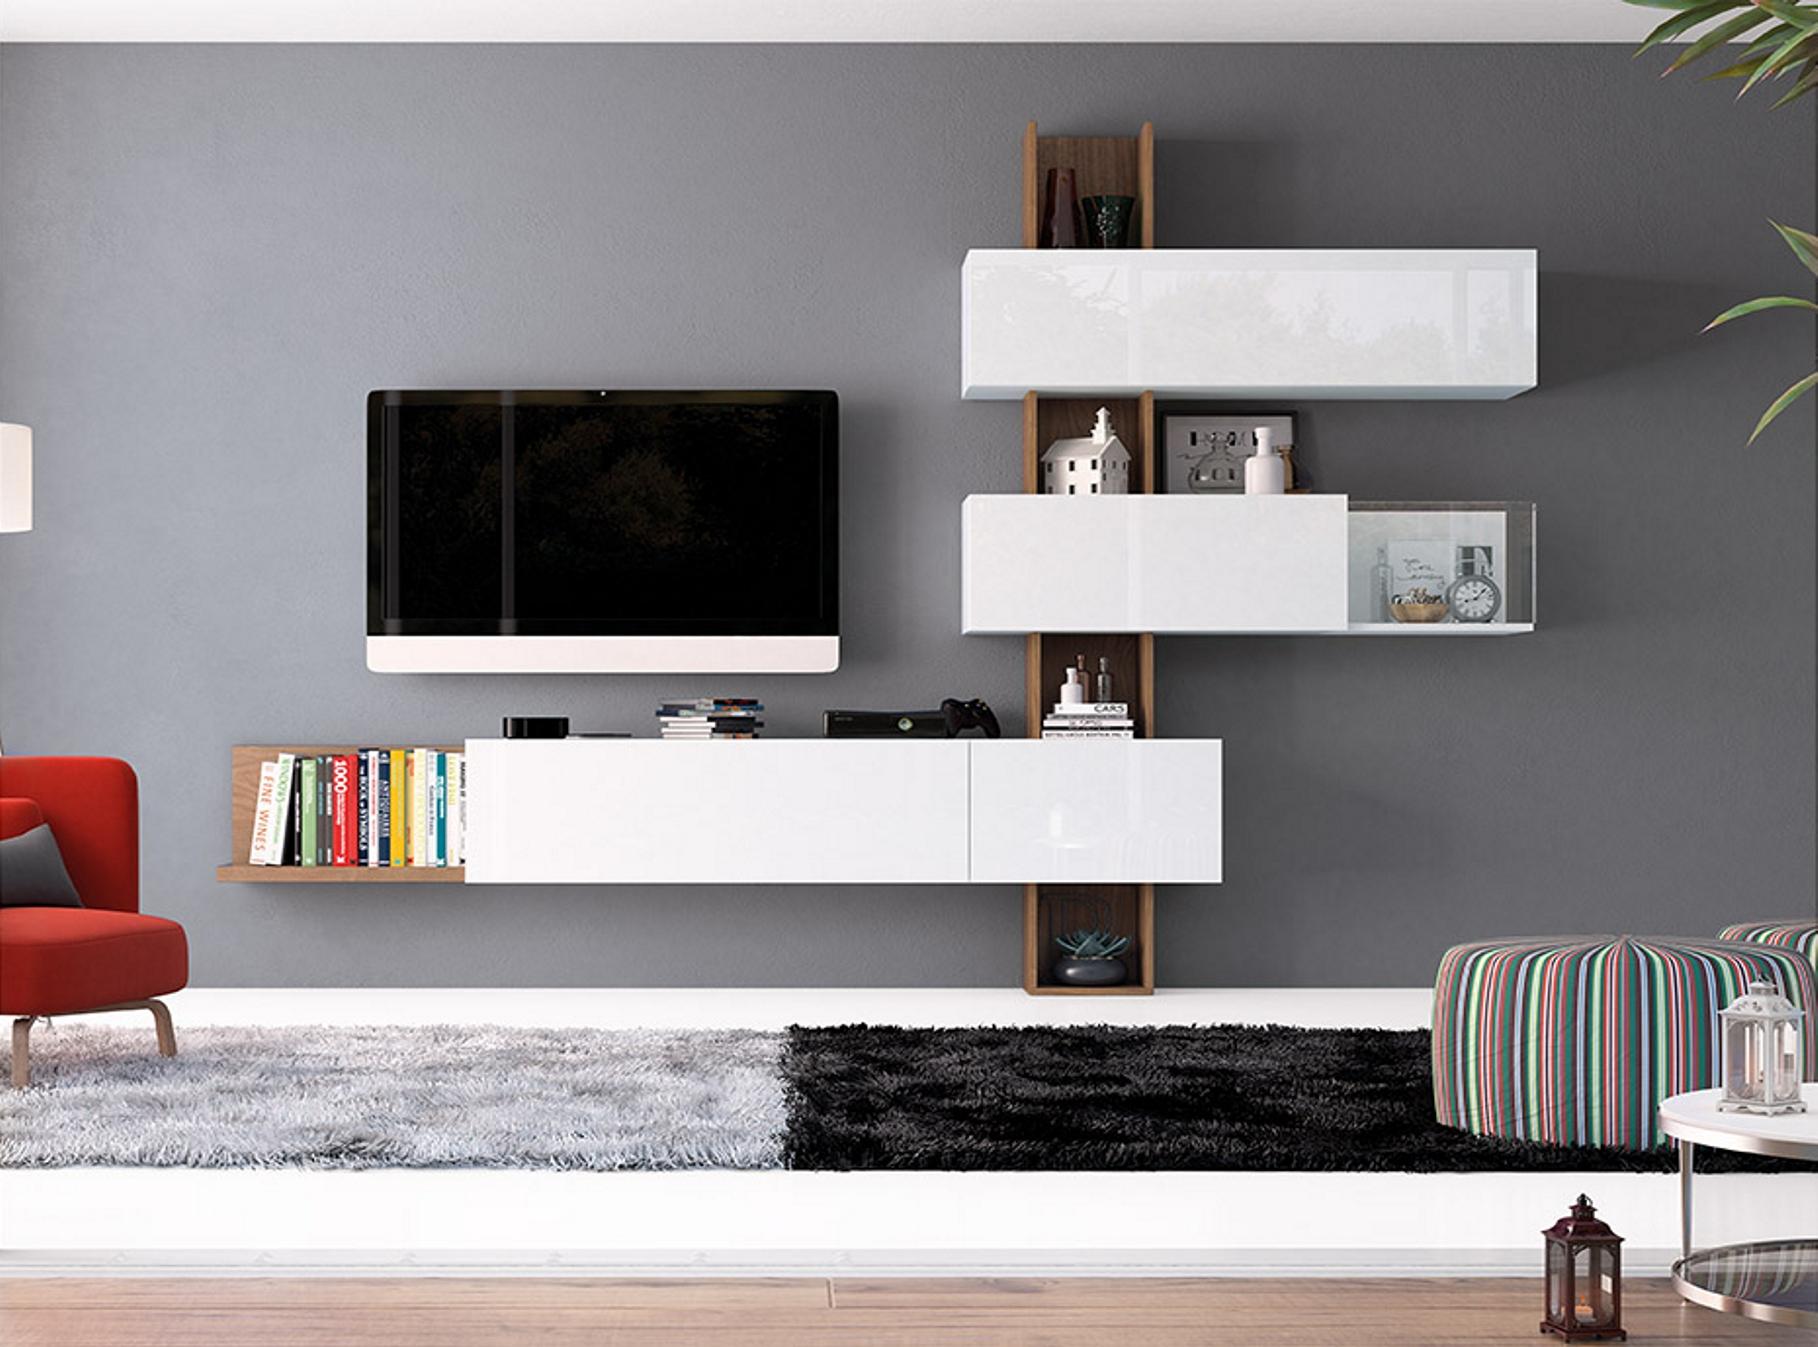 salon-moderno-Zion-3.0-muebles-paco-caballero-0907-5c8d32deecaf1